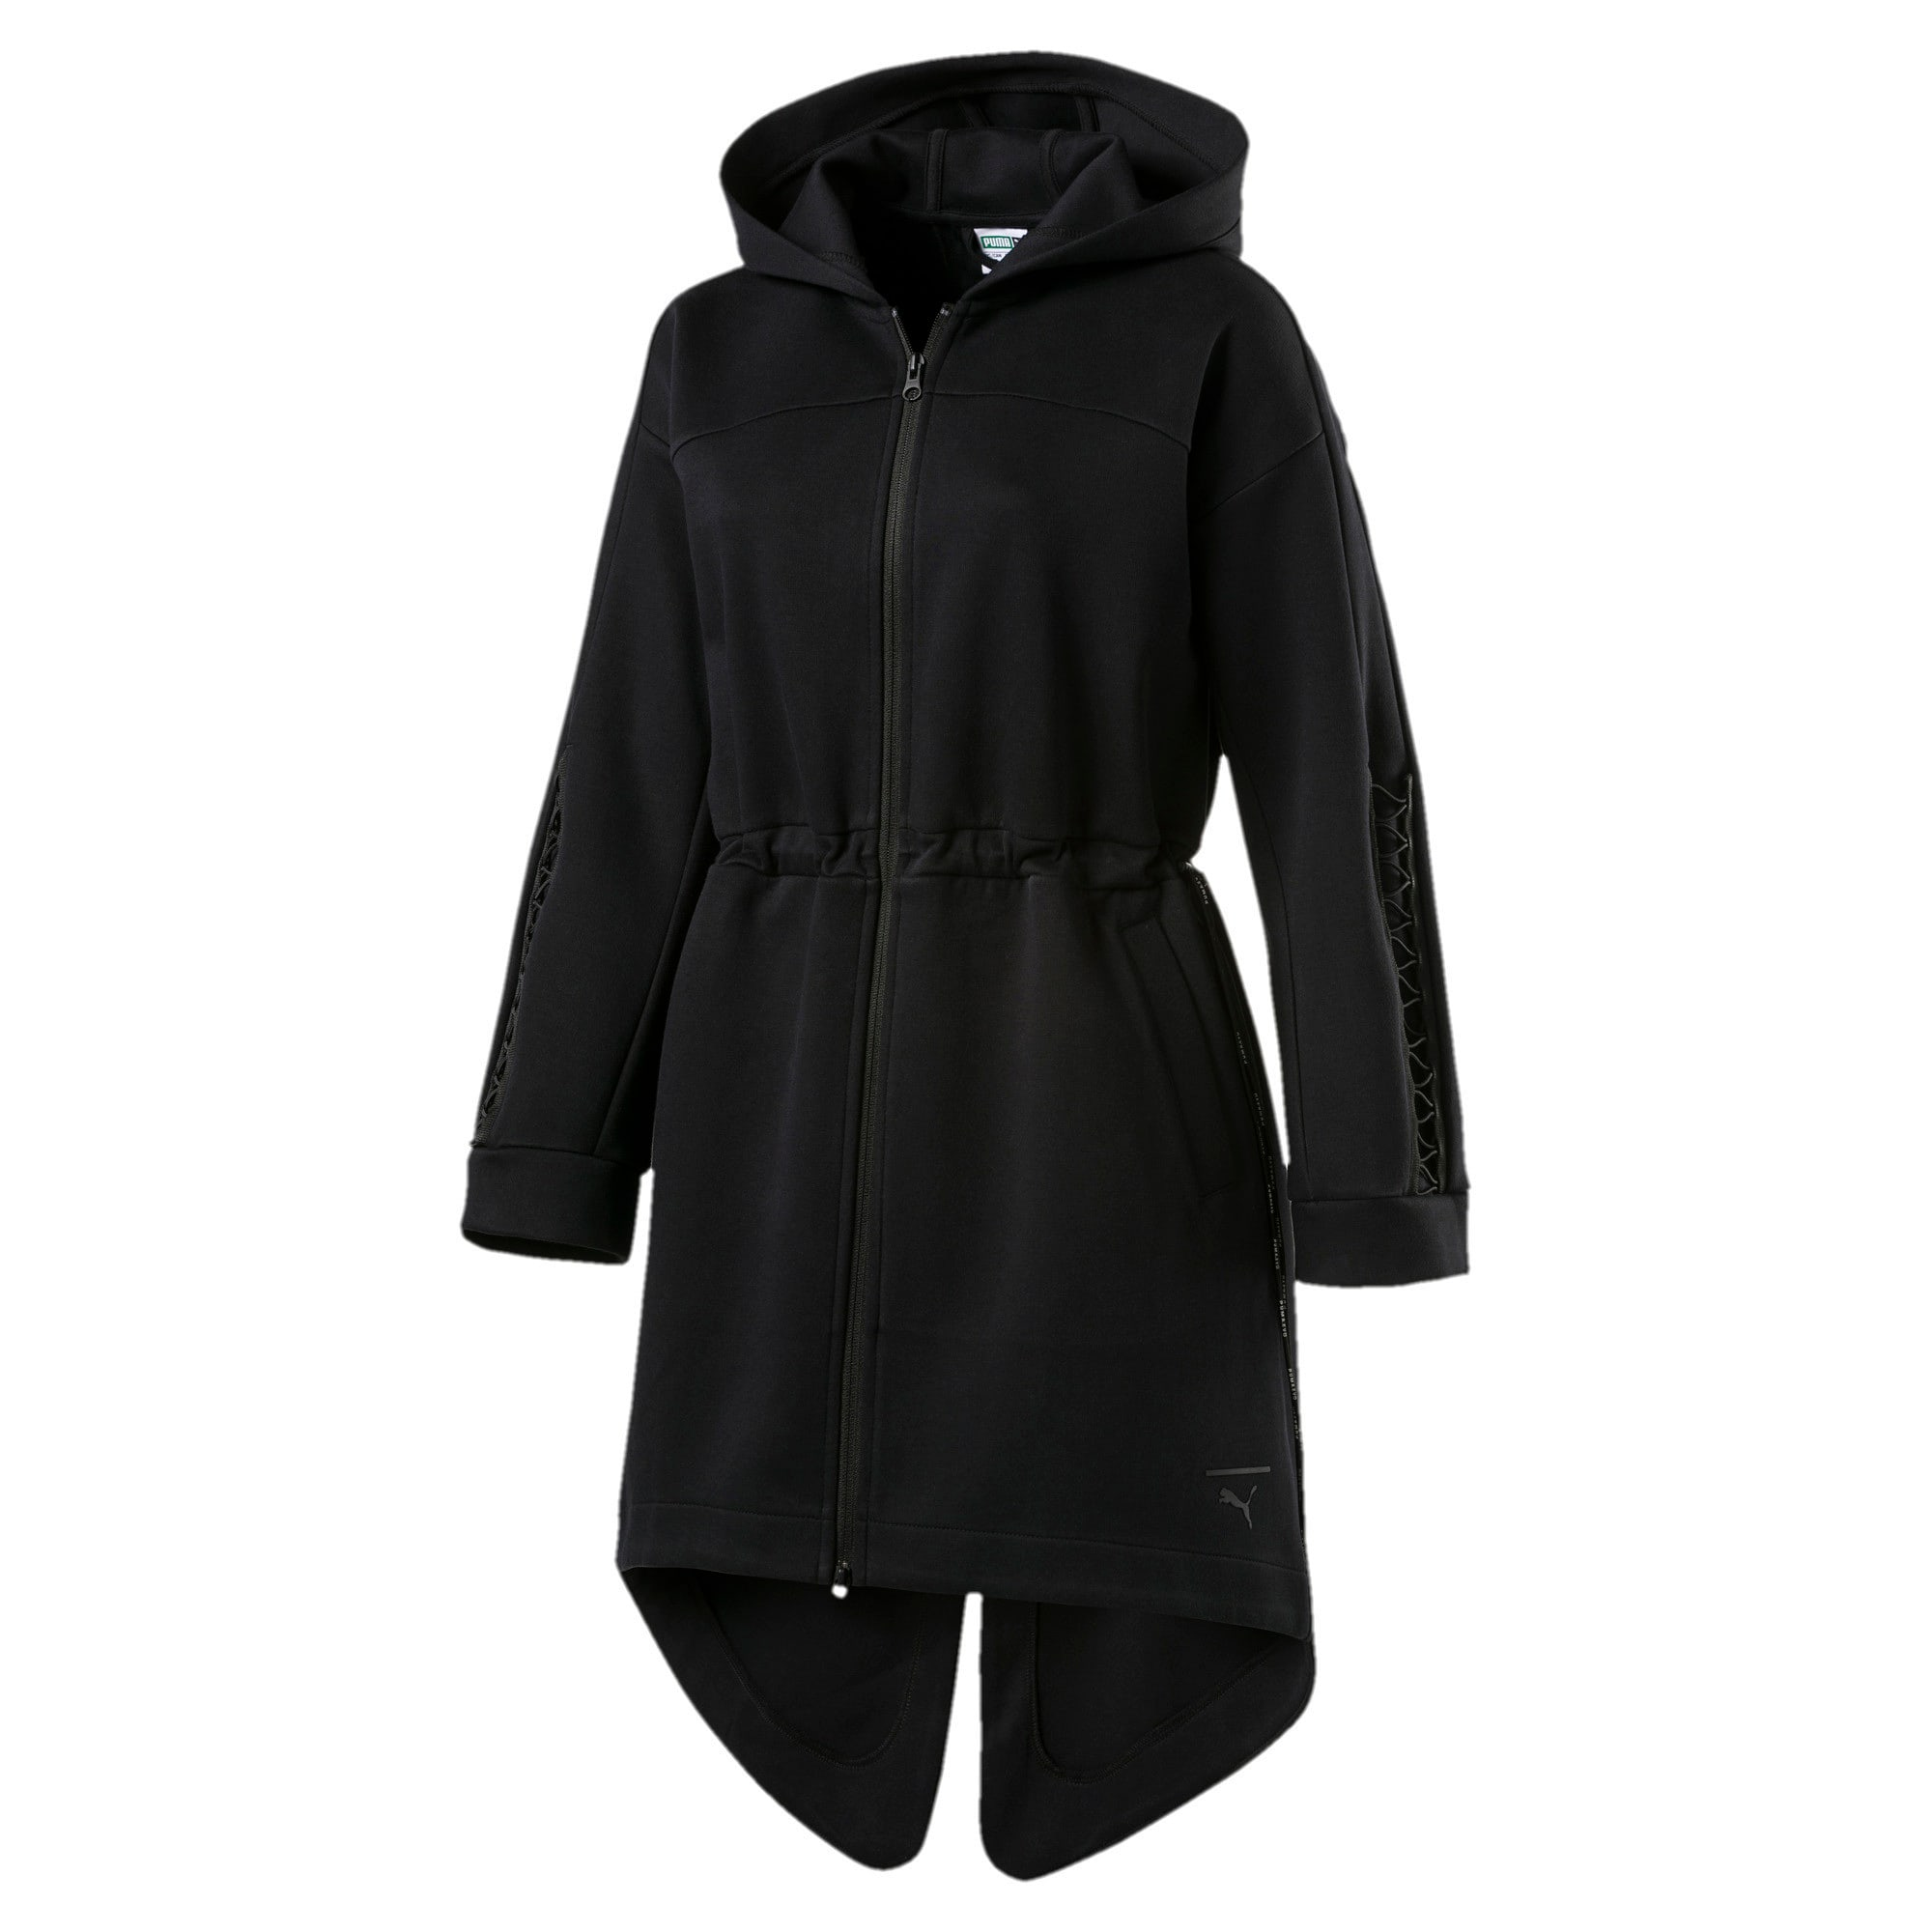 Thumbnail 4 of Evolution Women's Lacing Midlayer Jacket, Puma Black, medium-IND